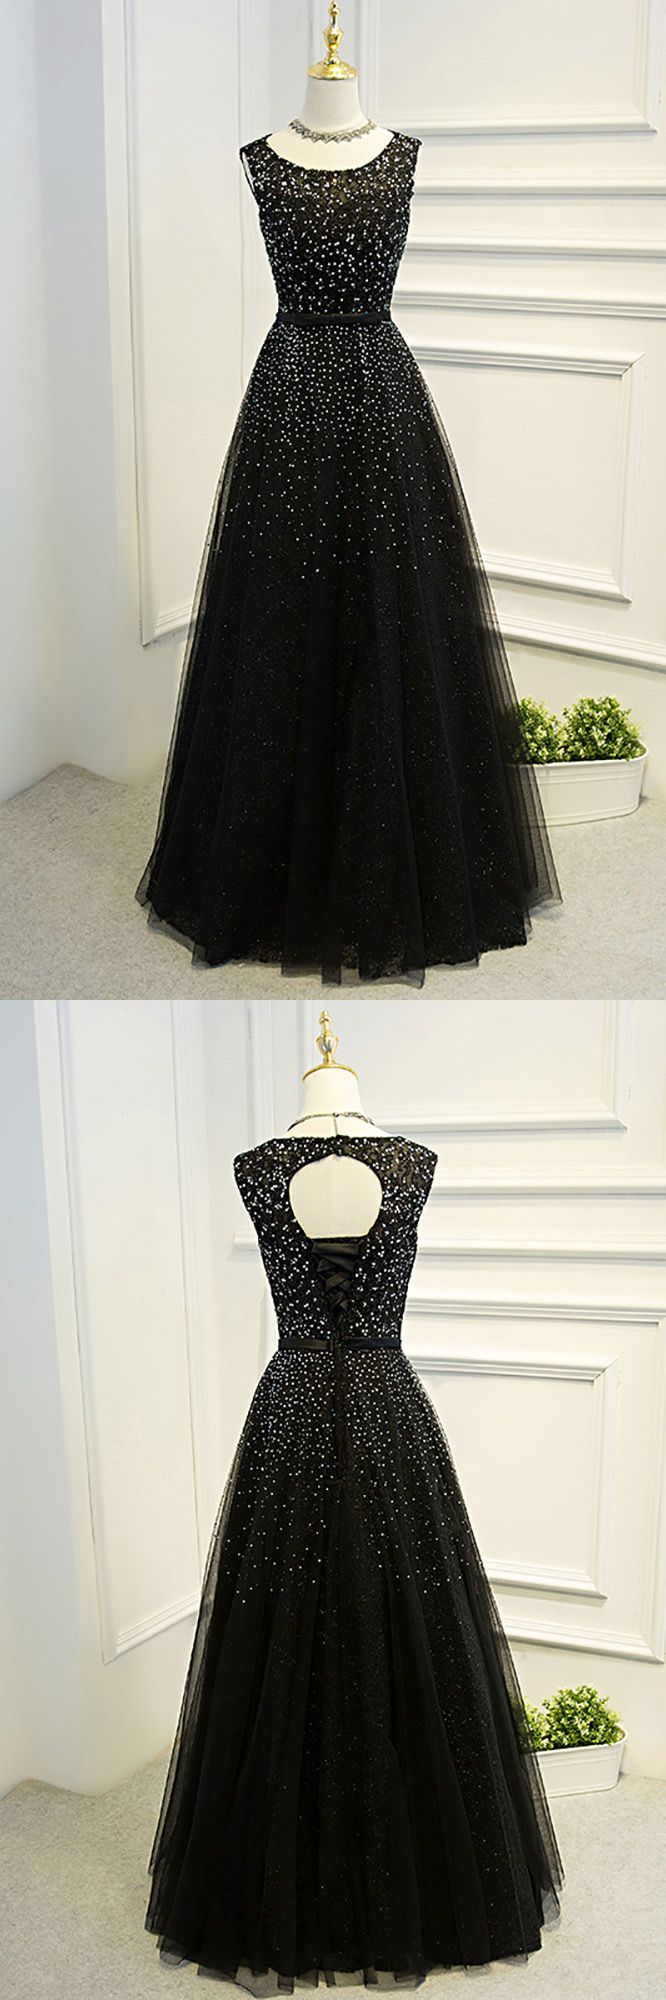 Sleeveless beaded long black ballgown prom dress with bling